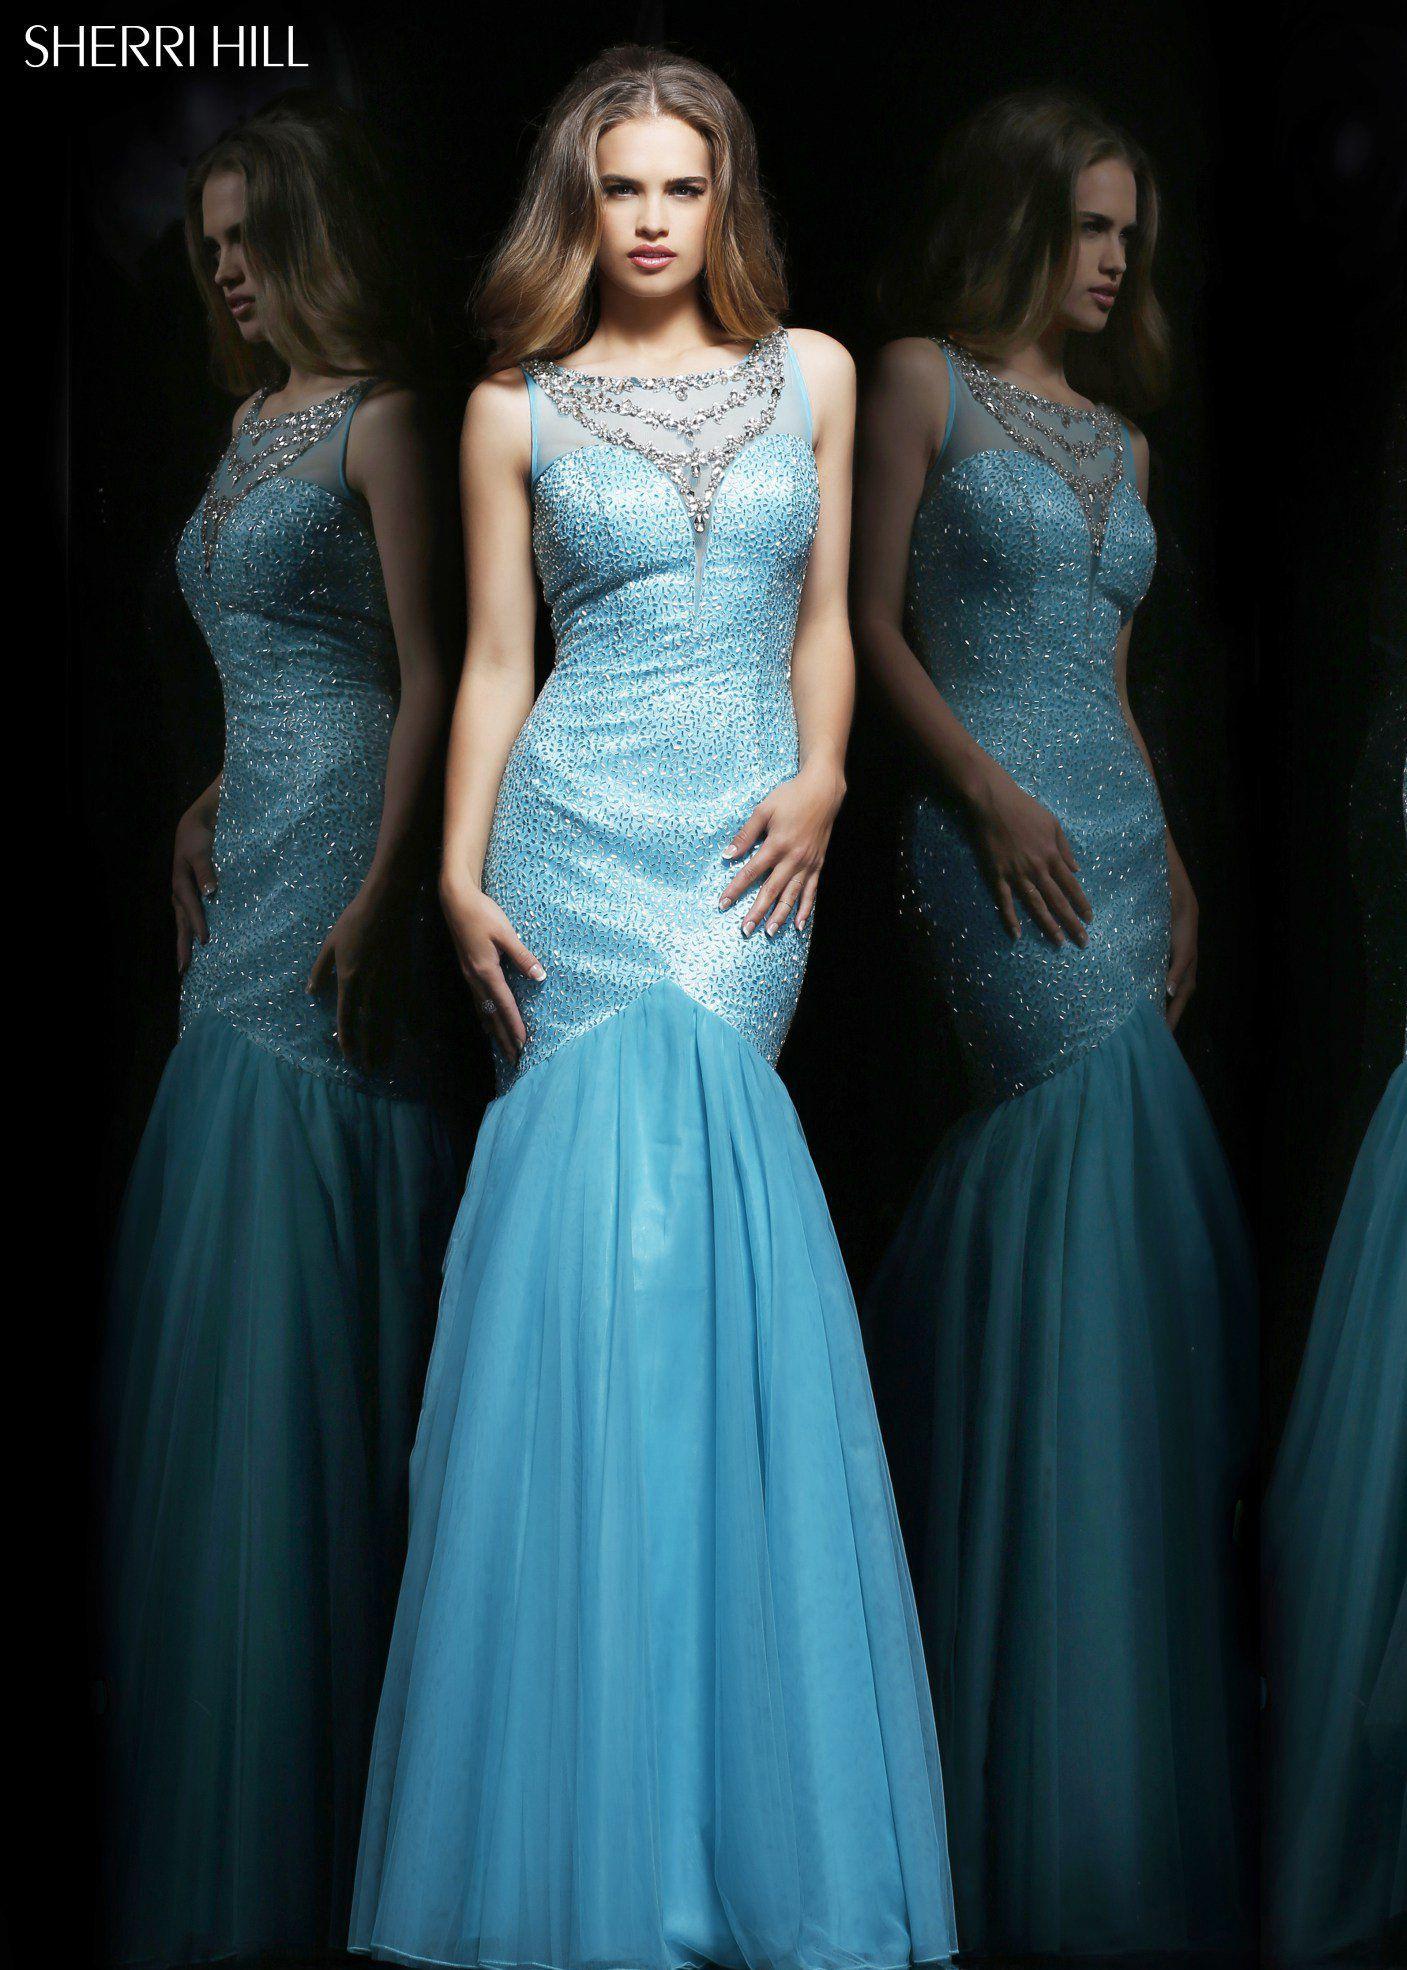 Sherri hill aquasilver beaded mermaid prom dresses online